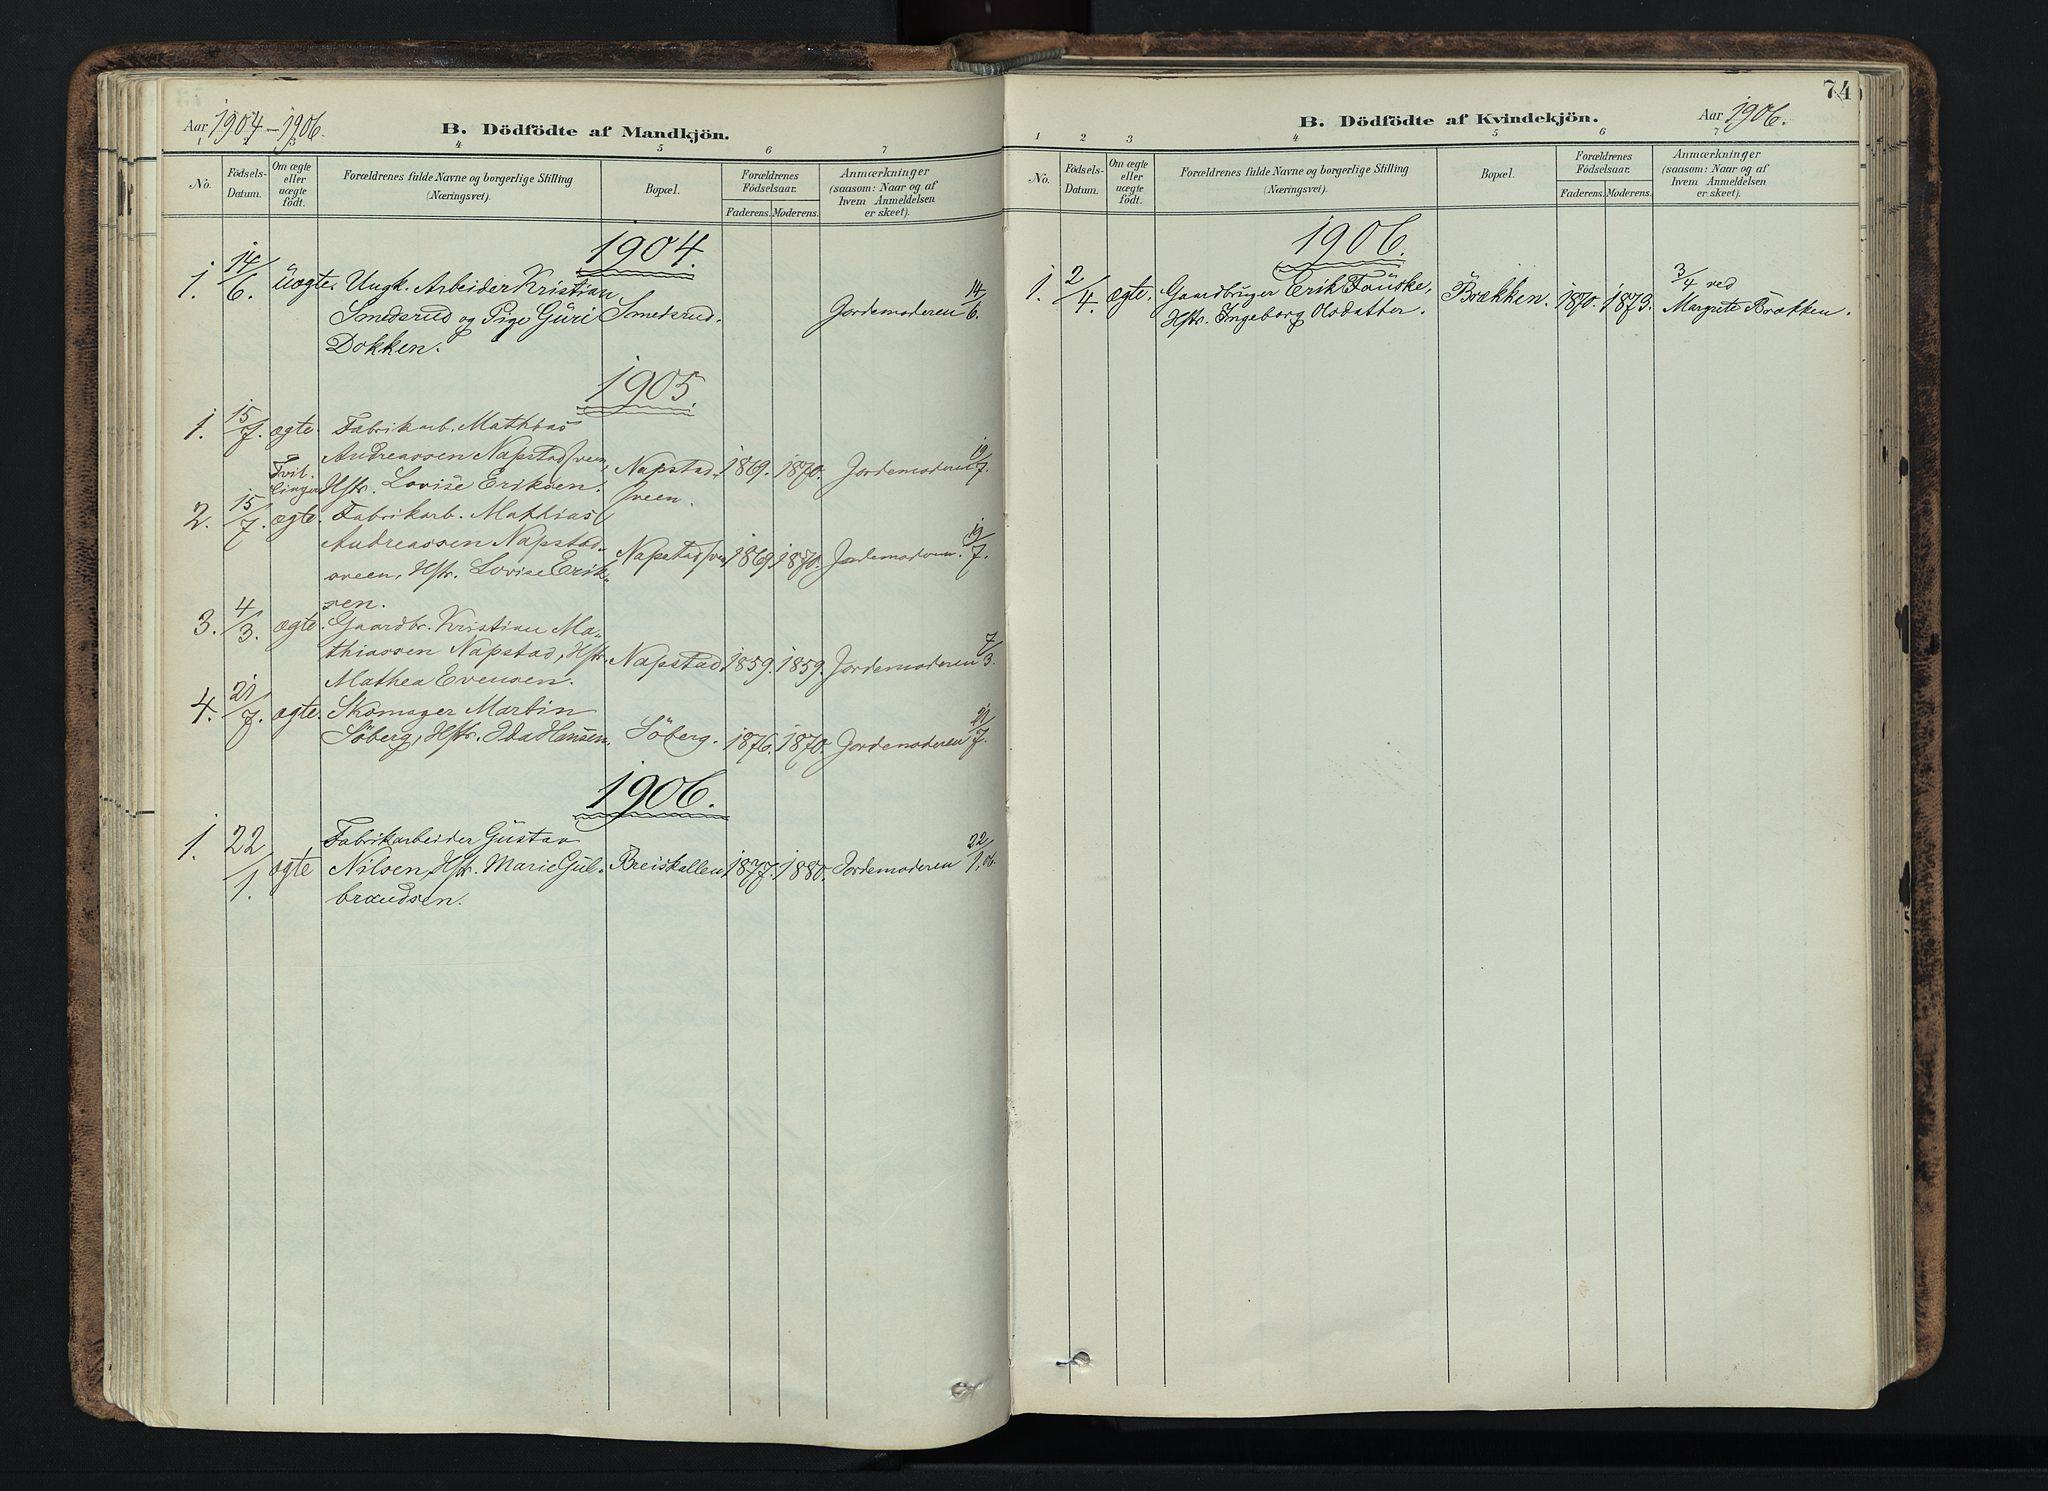 SAH, Vardal prestekontor, H/Ha/Haa/L0019: Ministerialbok nr. 19, 1893-1907, s. 74